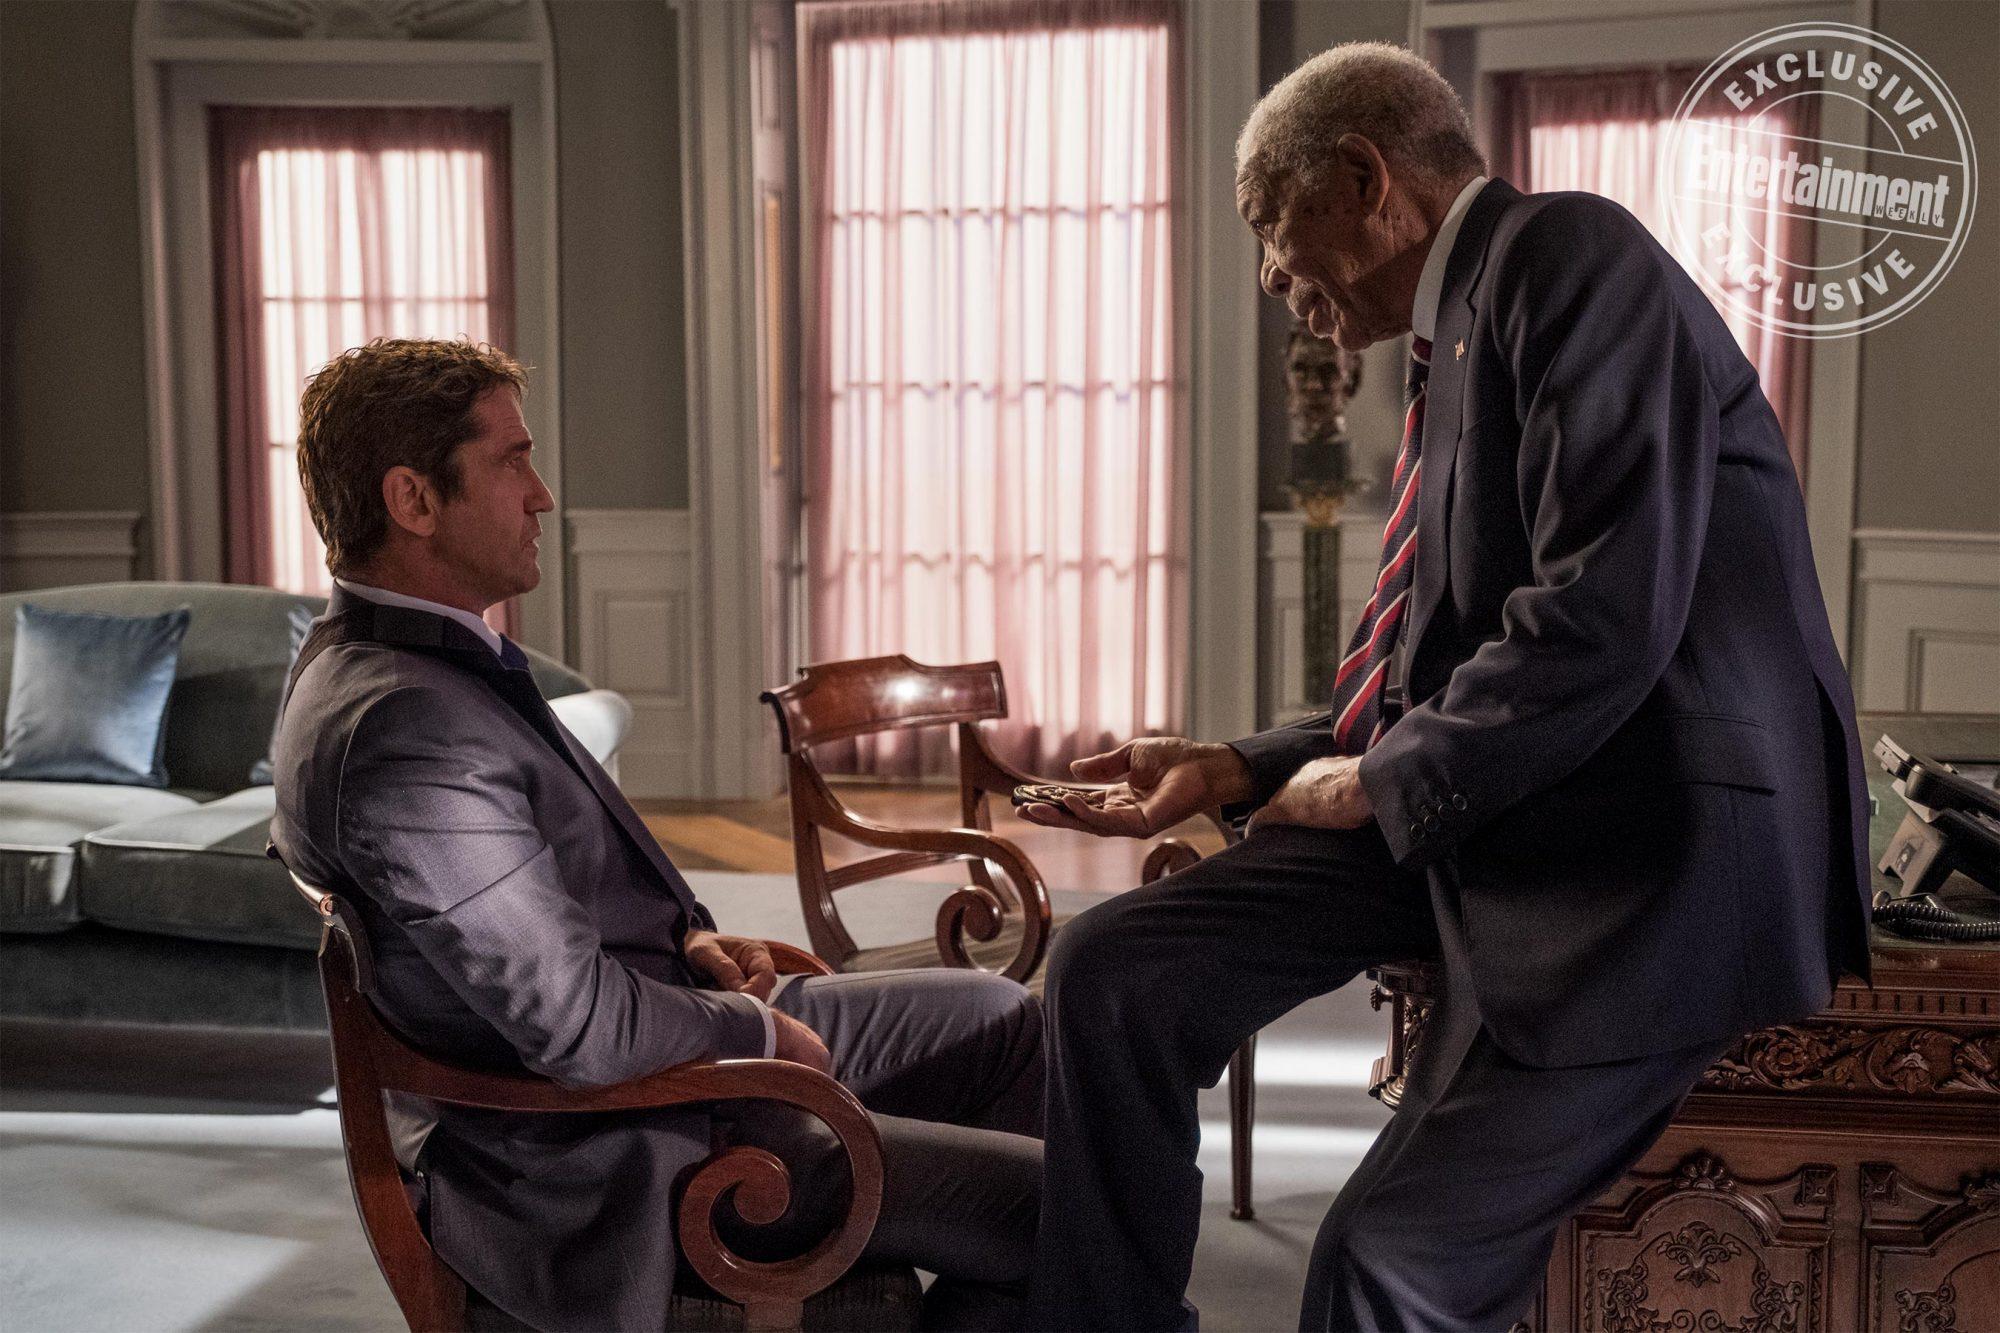 Angel Has Fallen (2019) Gerard Butler and Morgan Freeman CR: Jack English/Lionsgate